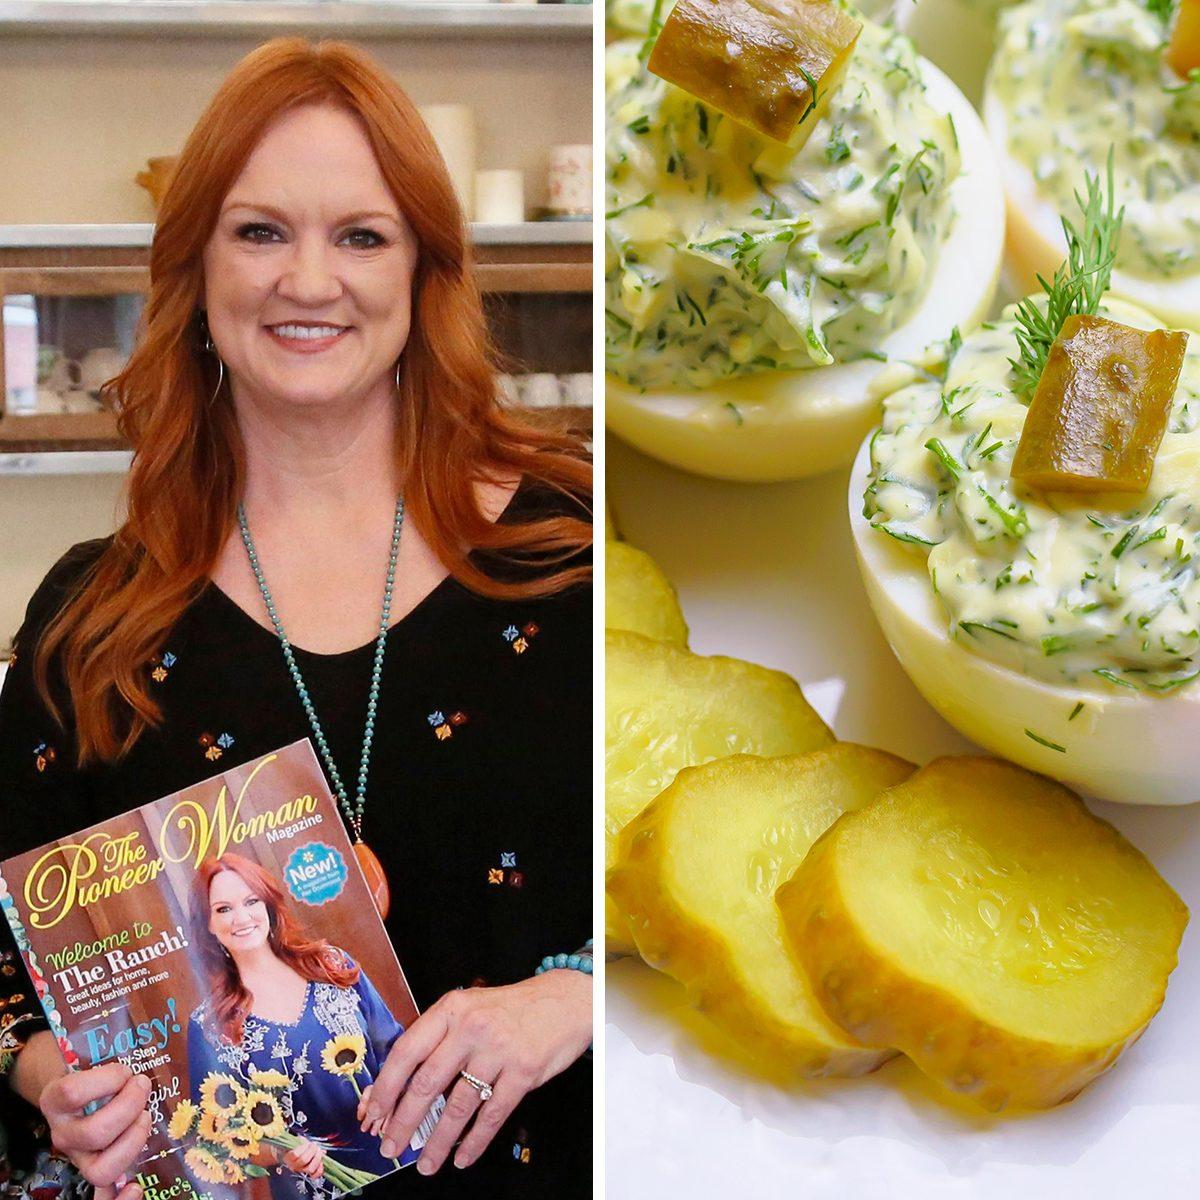 11 Celebrity Chefs Reveal Their Secret Ingredient for Deviled Eggs